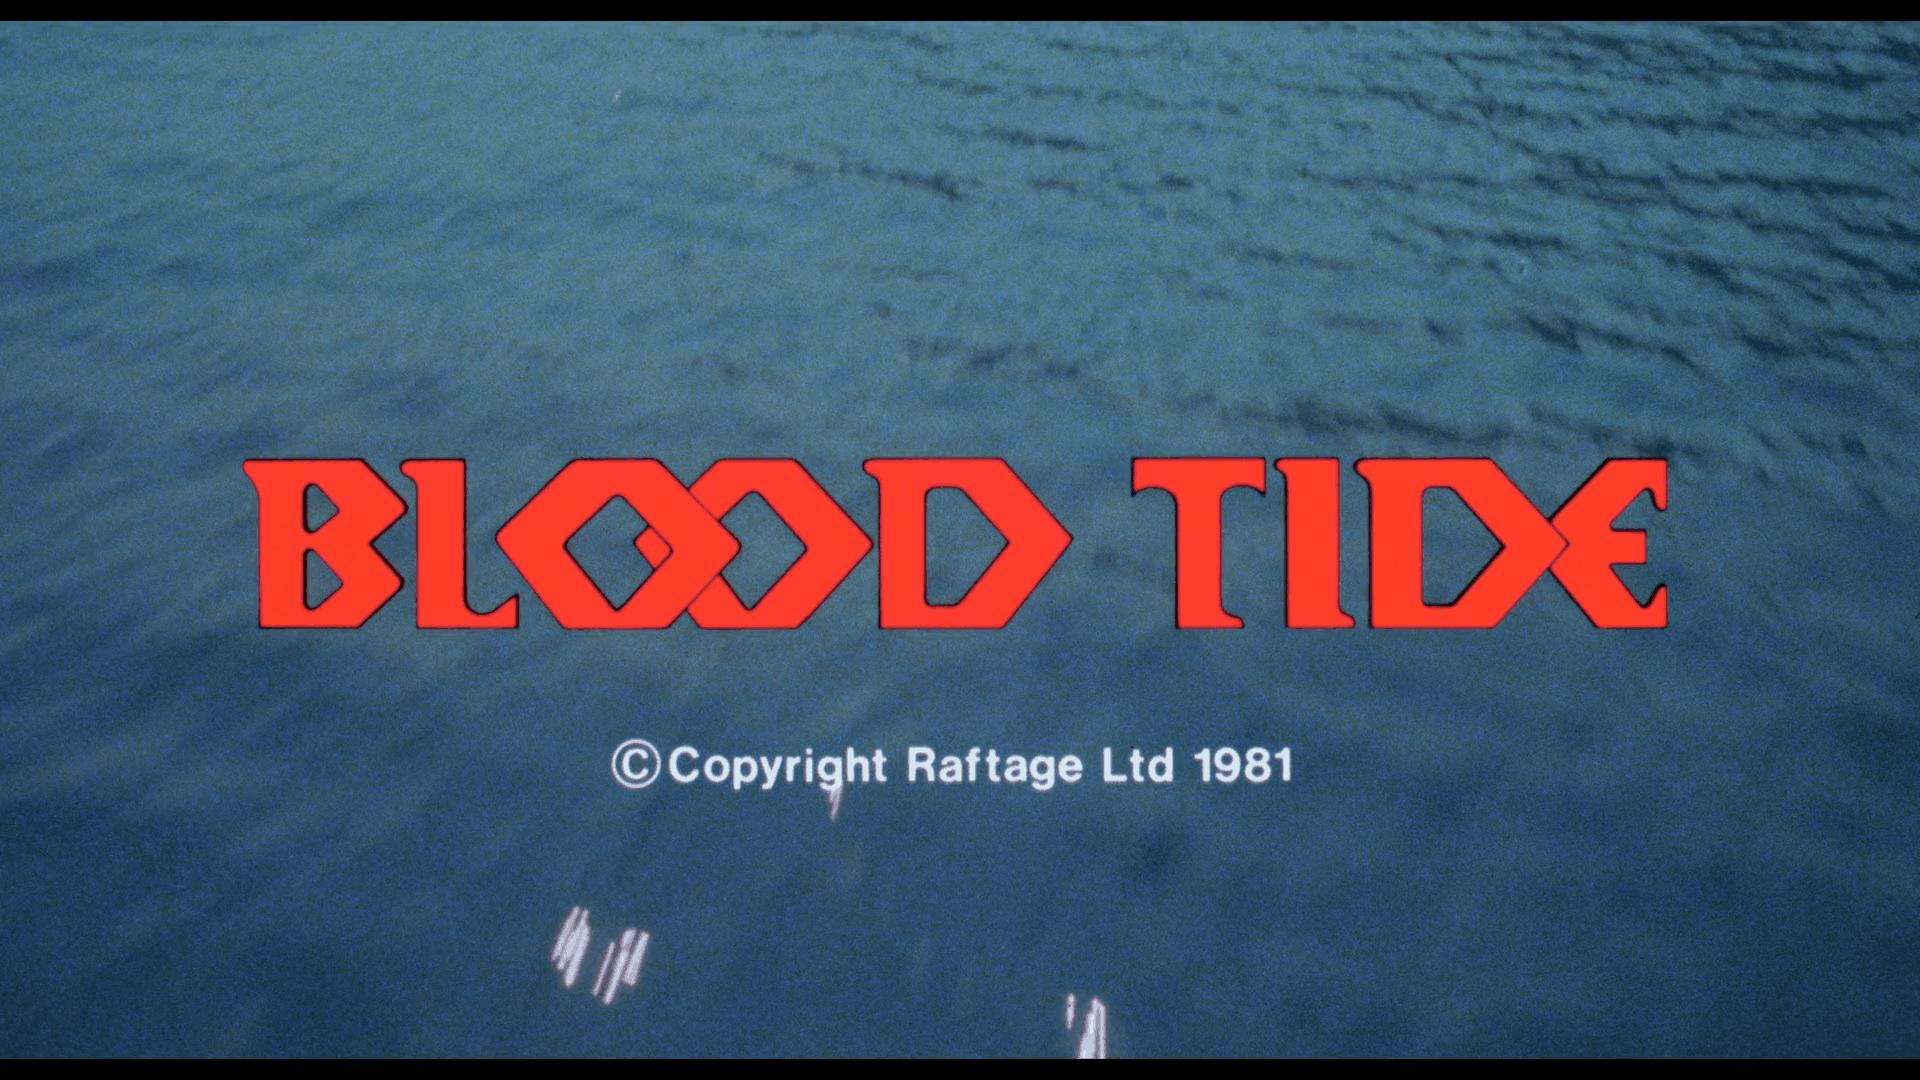 blood tide title